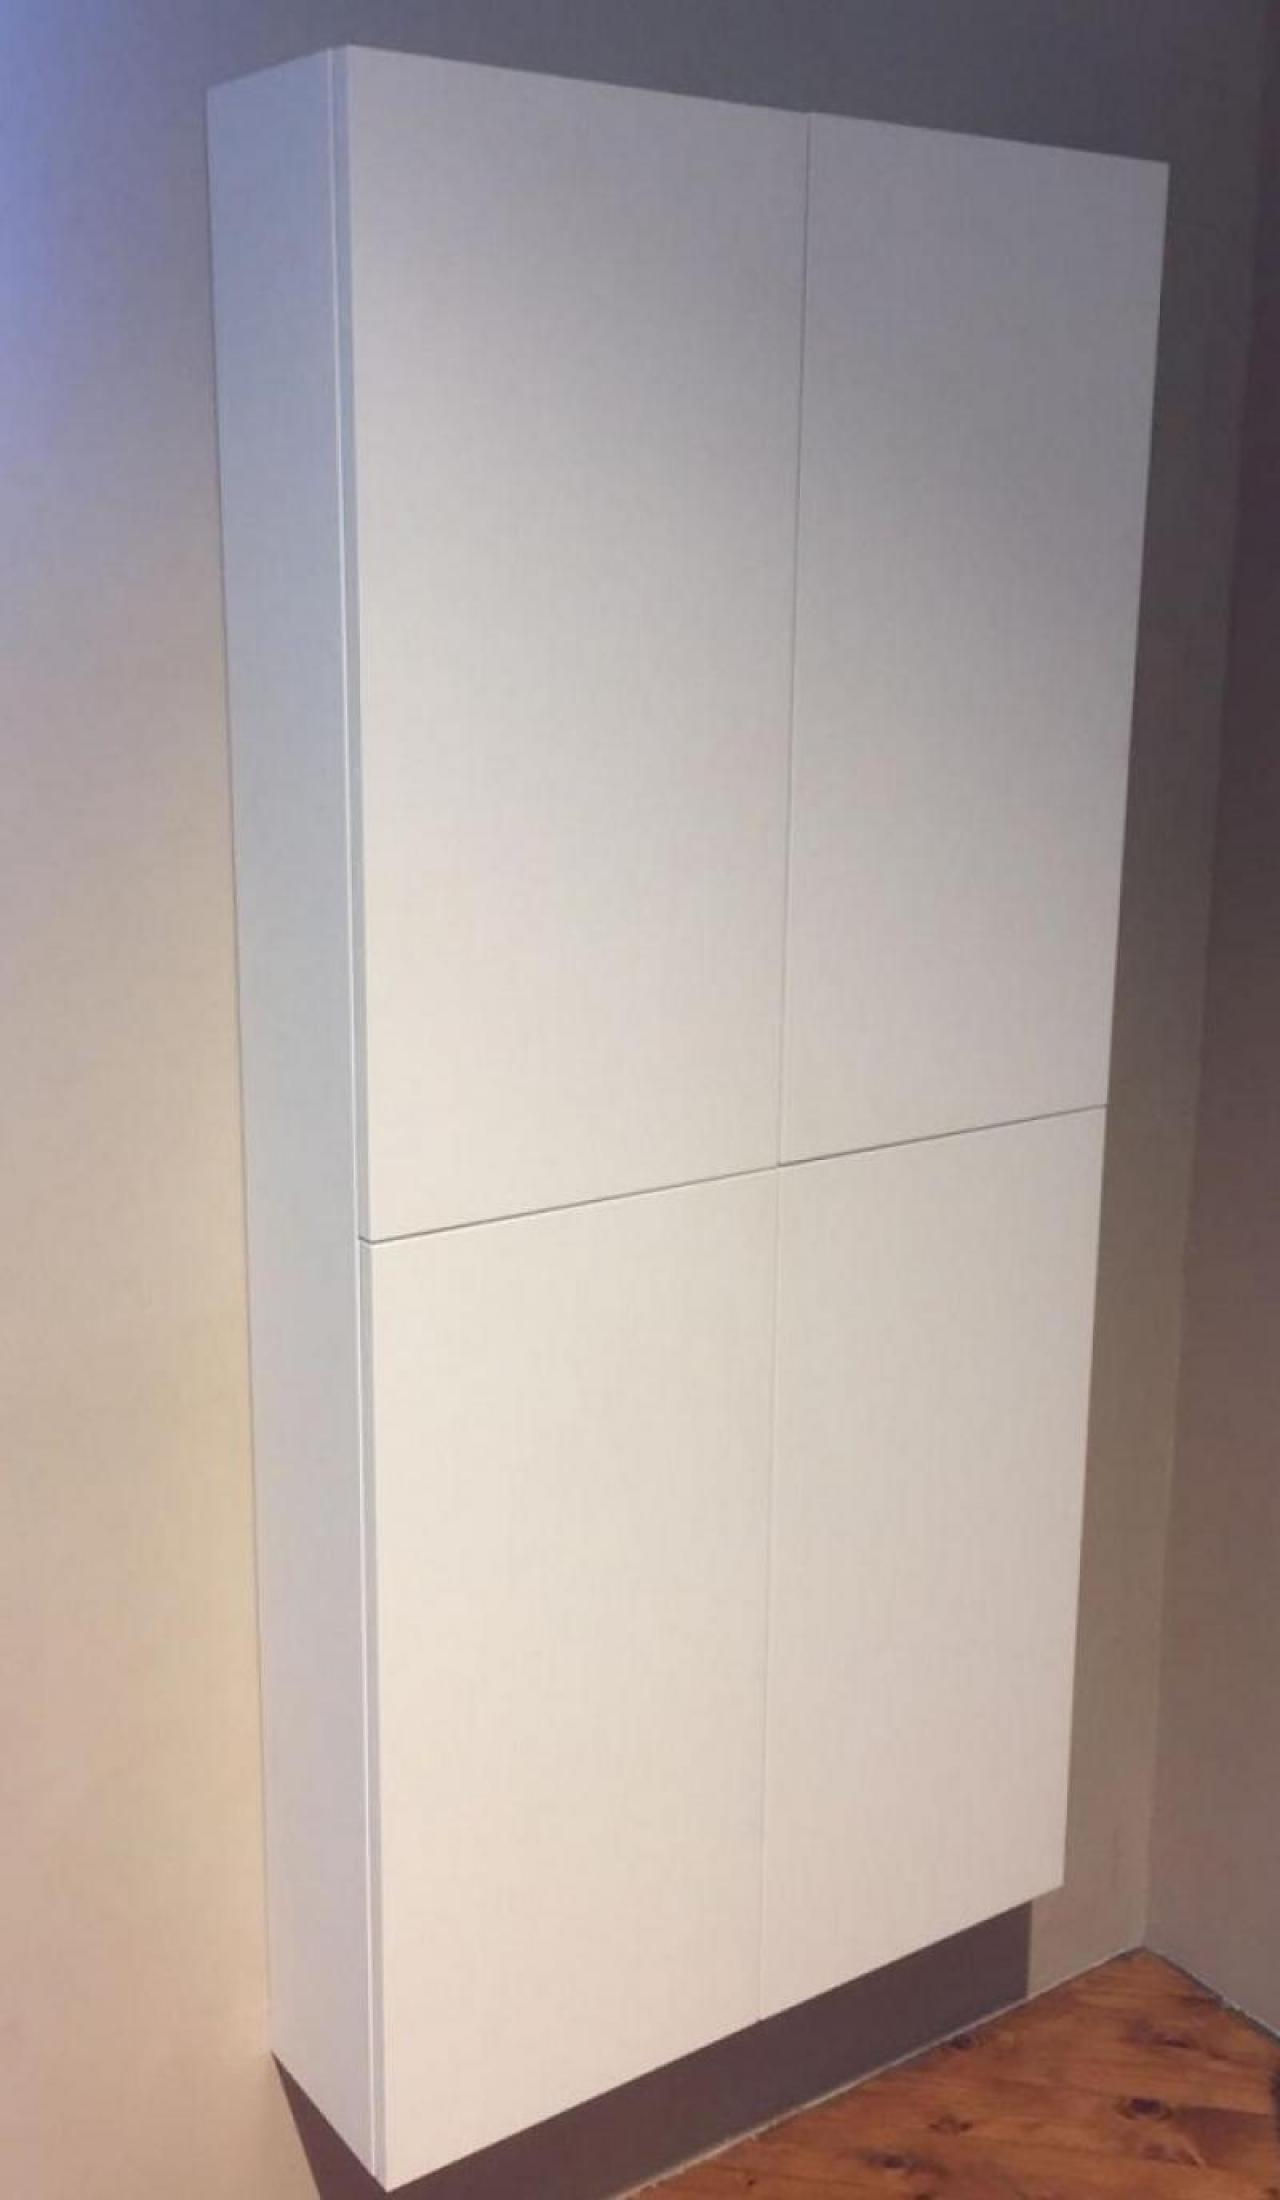 Colonna bagno sospesa bianca - prezzi outlet Vicenza | Fratelli ...